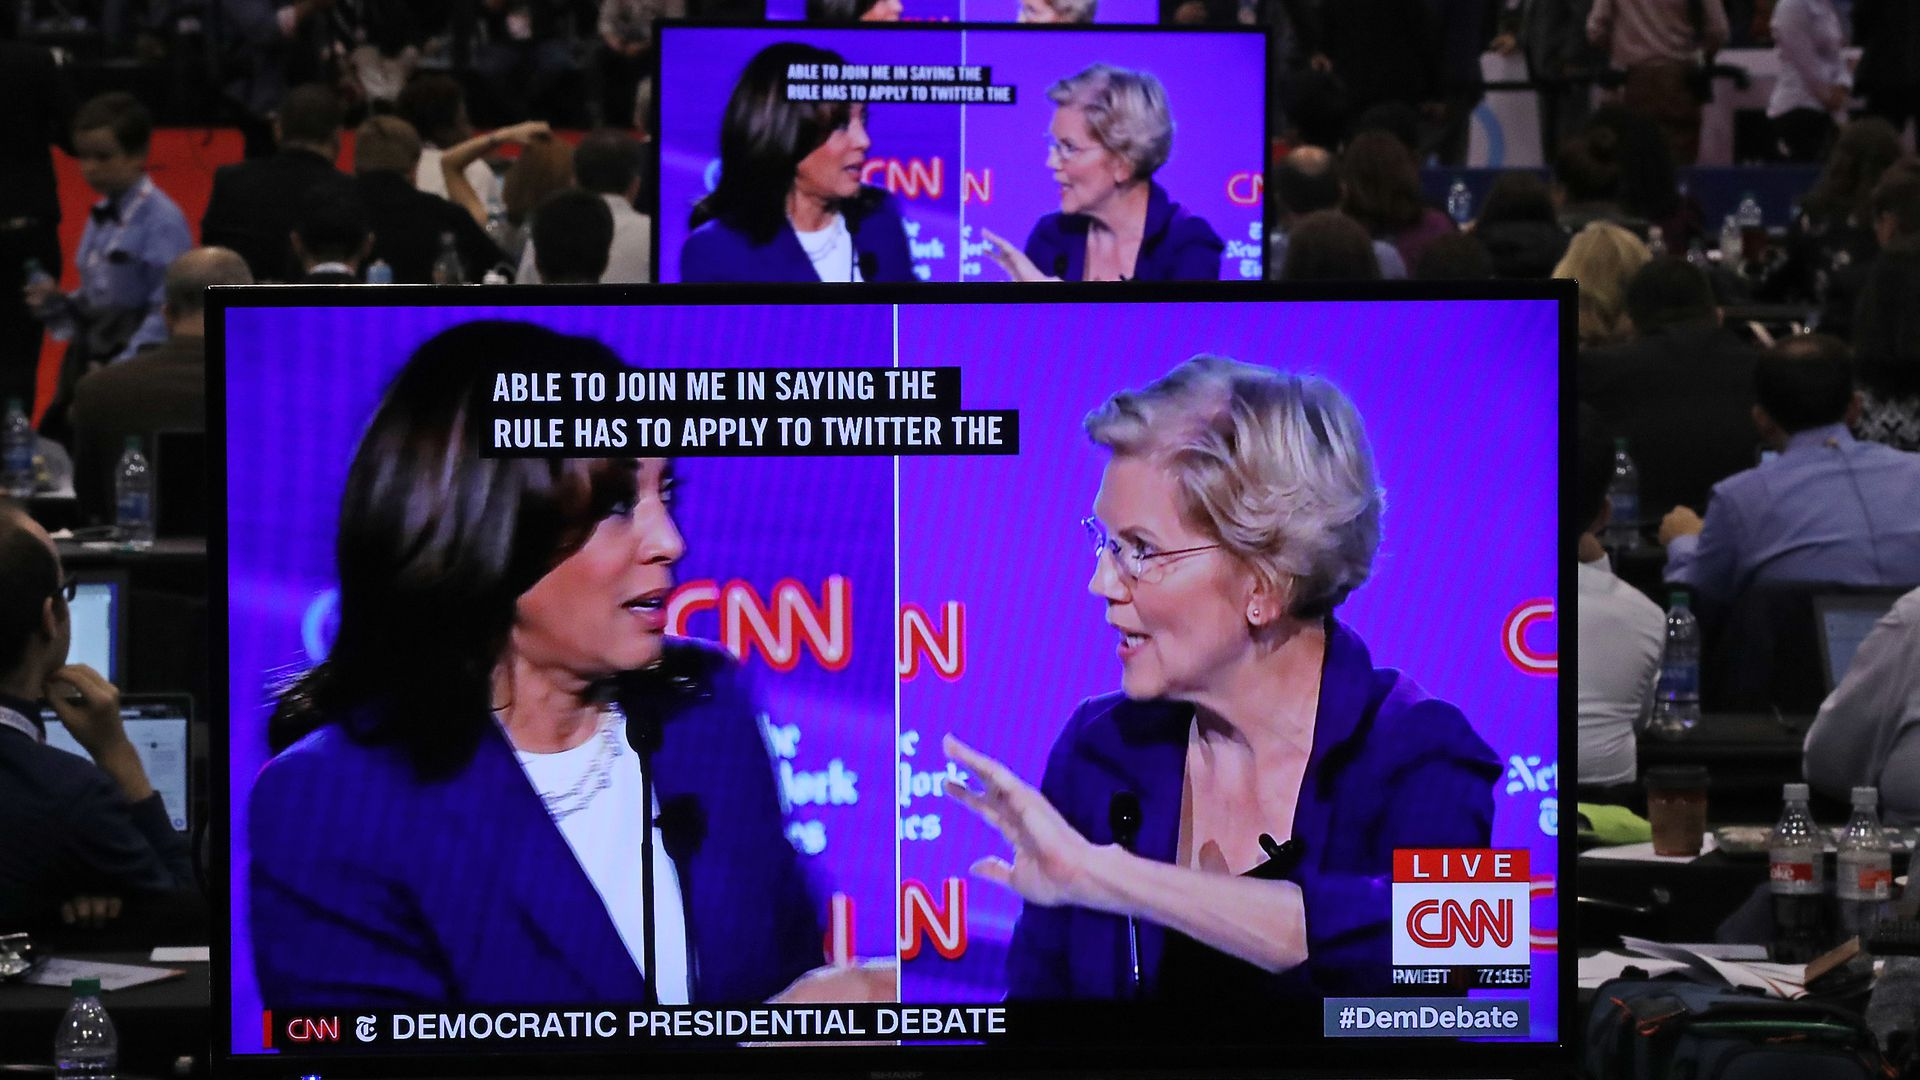 Photo of Sens. Kamala Harris and Elizabeth Warren debating on a screen